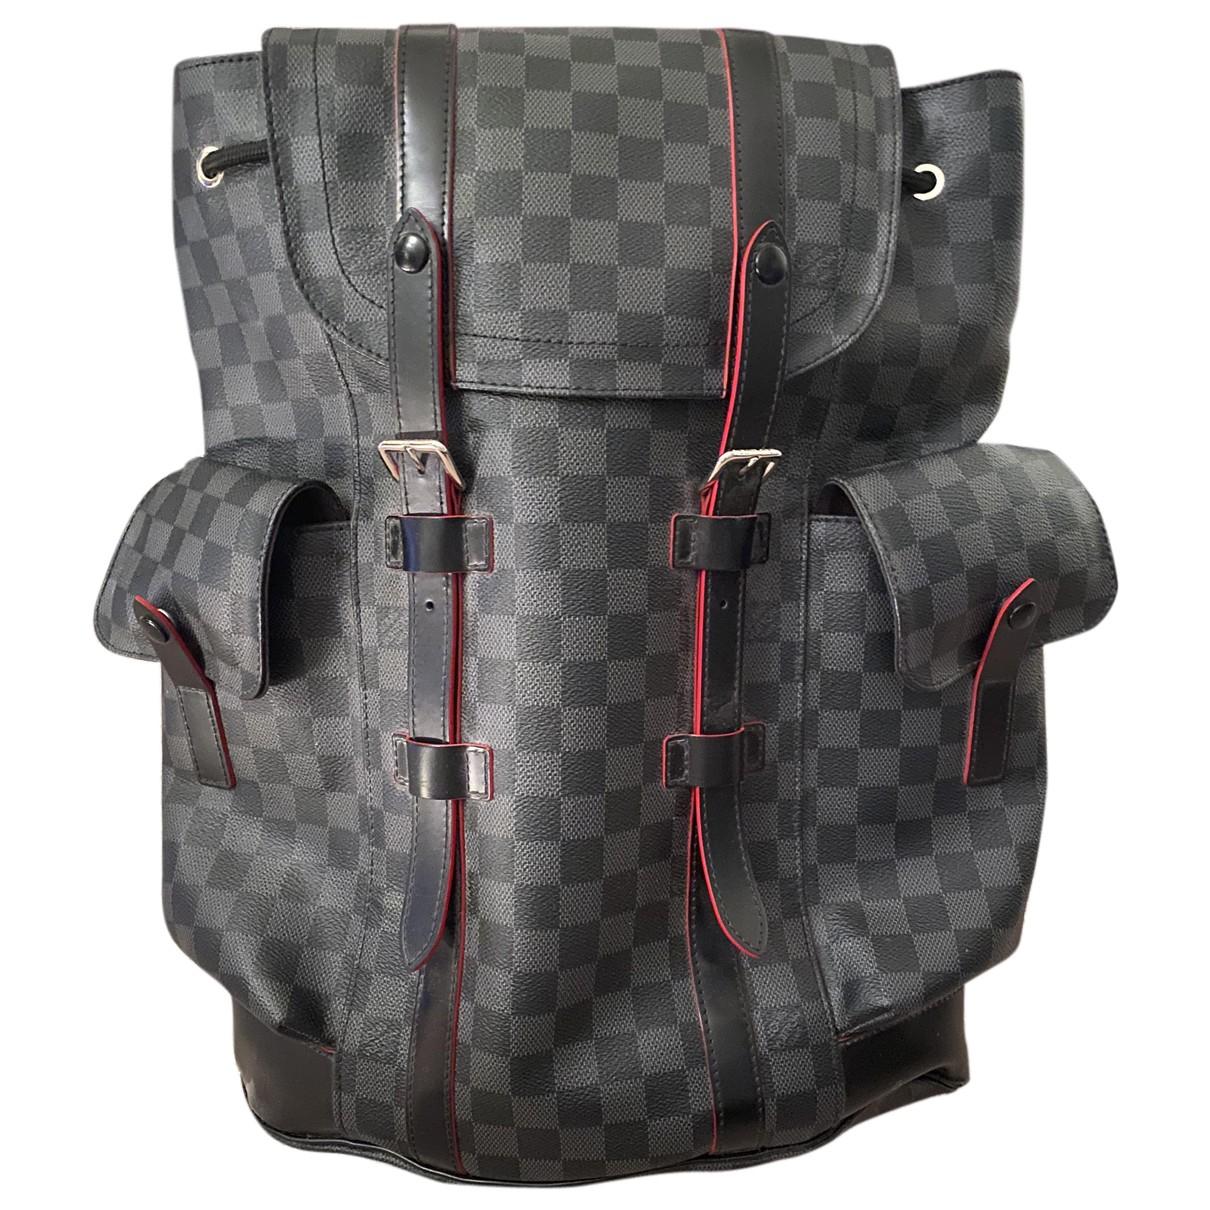 Louis Vuitton Christopher Backpack Grey Cloth bag for Men N